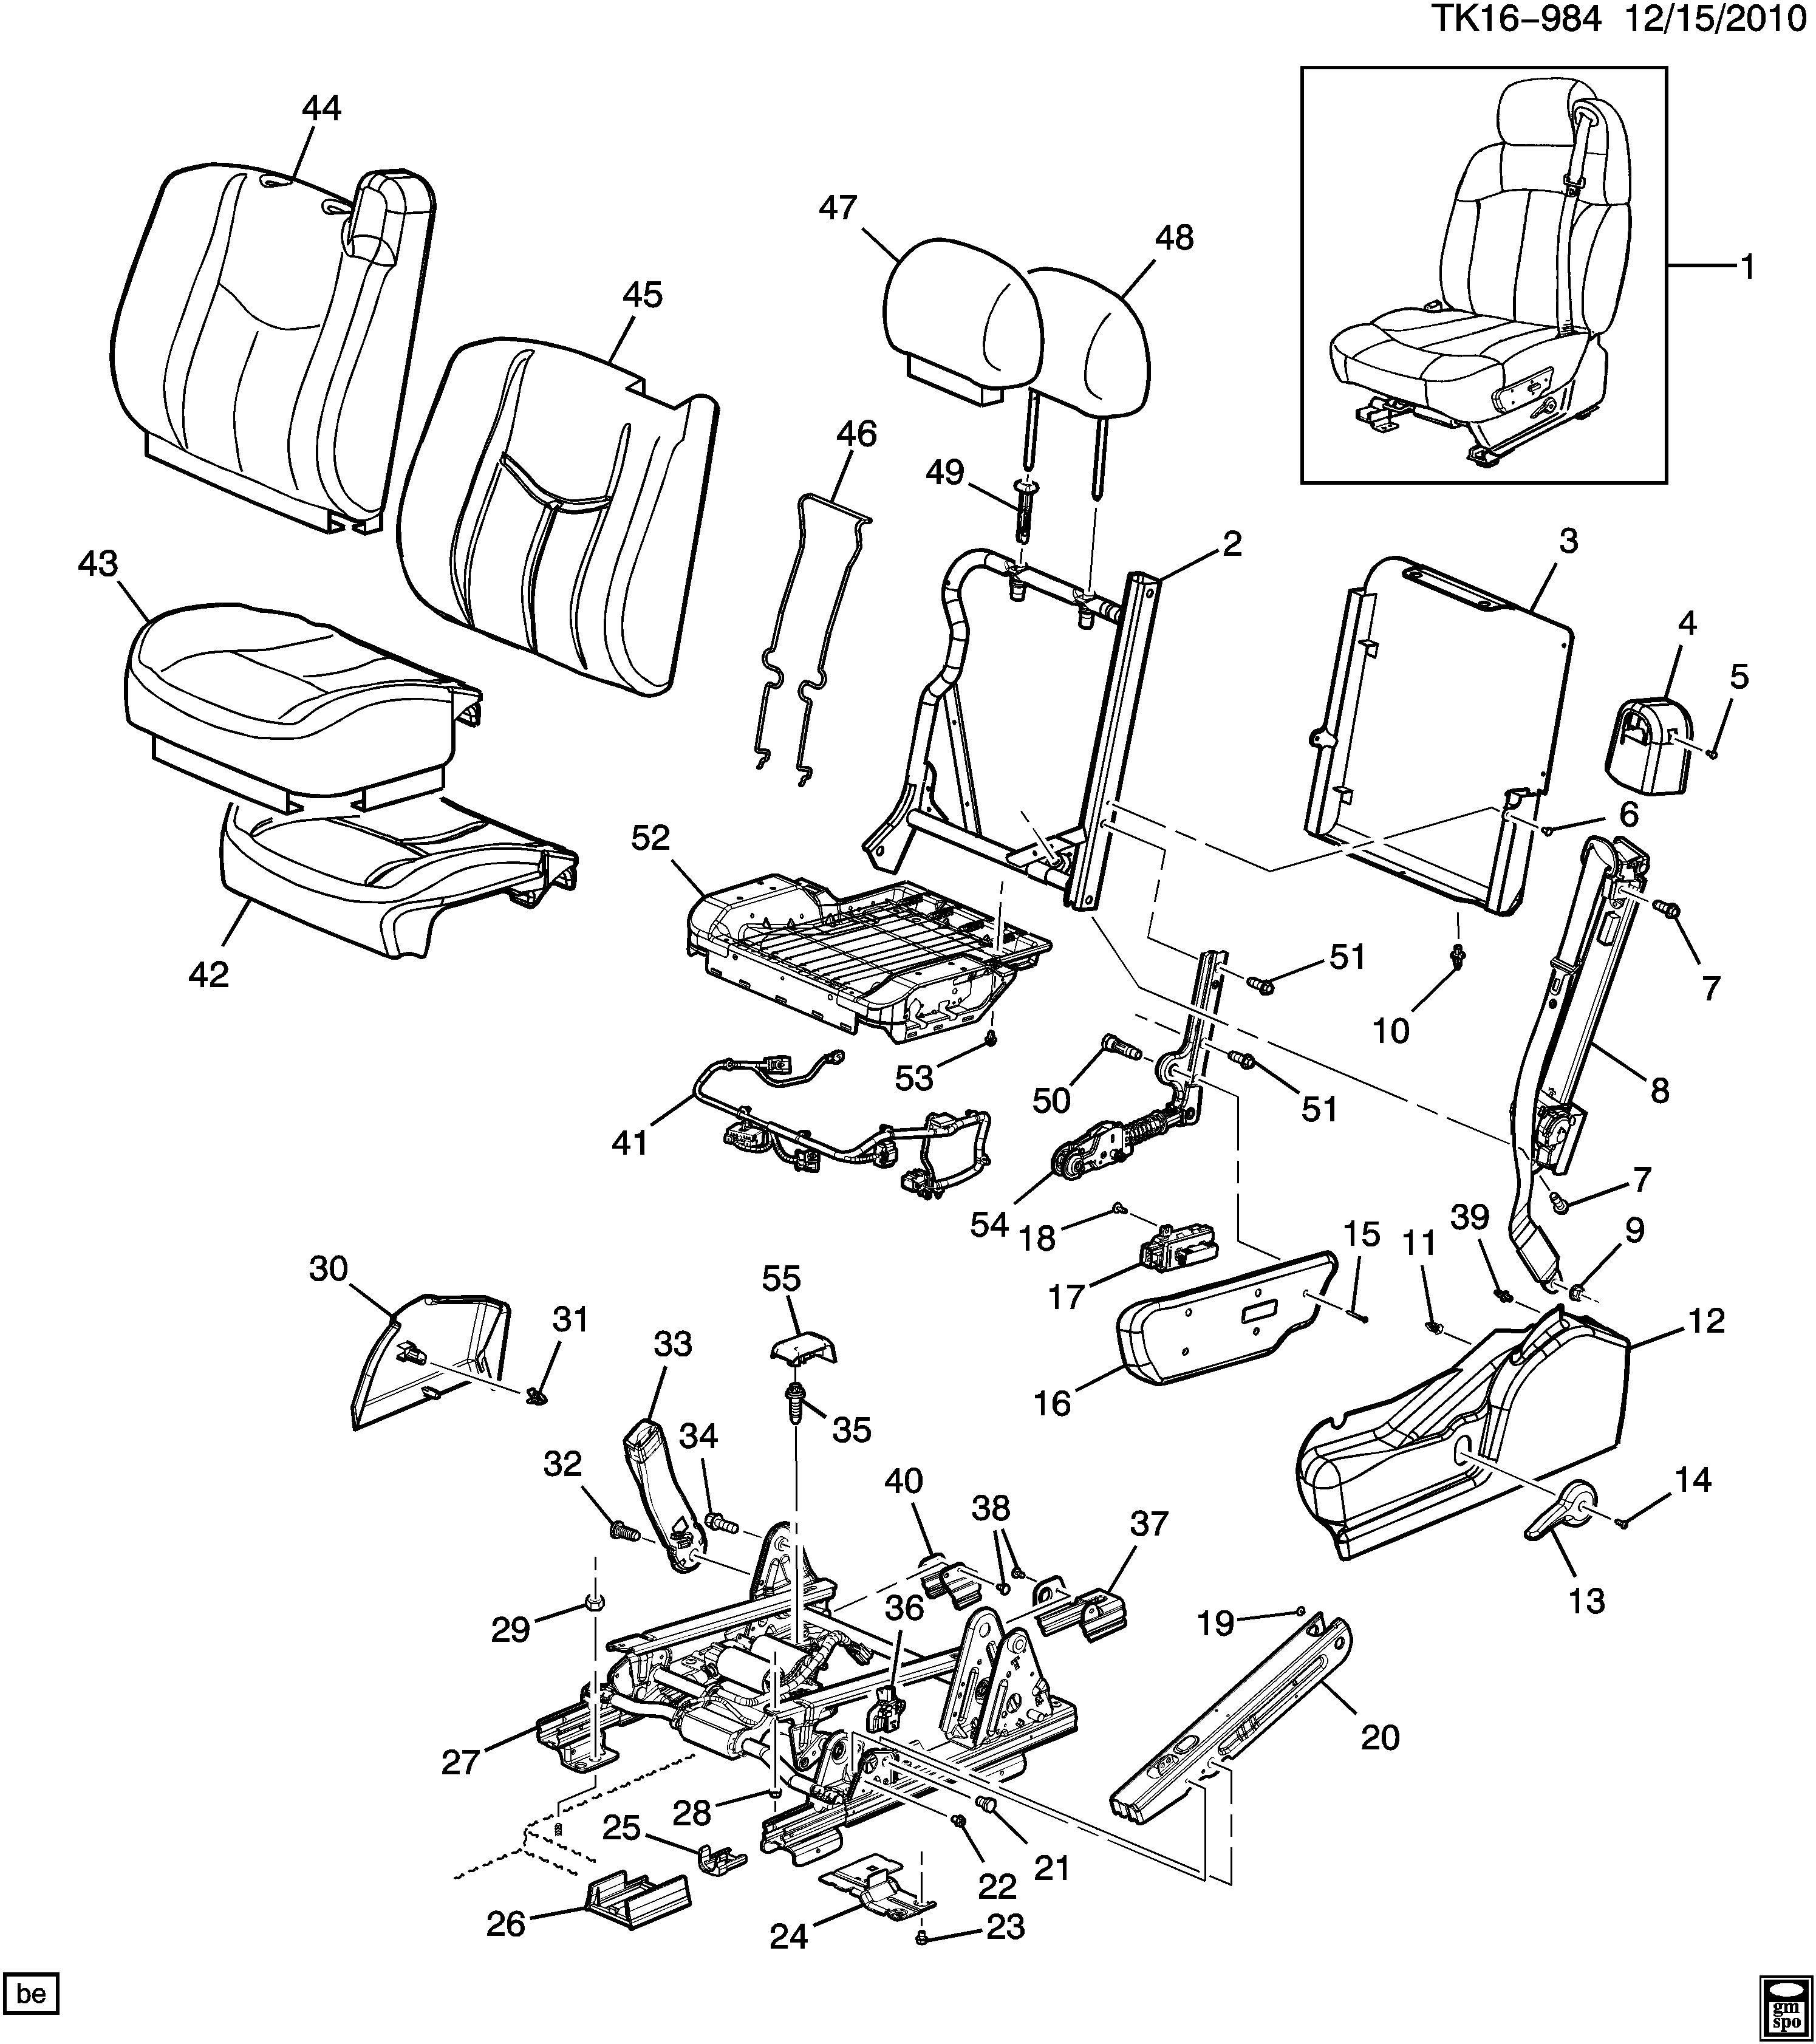 Chevrolet Silverado Driver Seat Split Bench